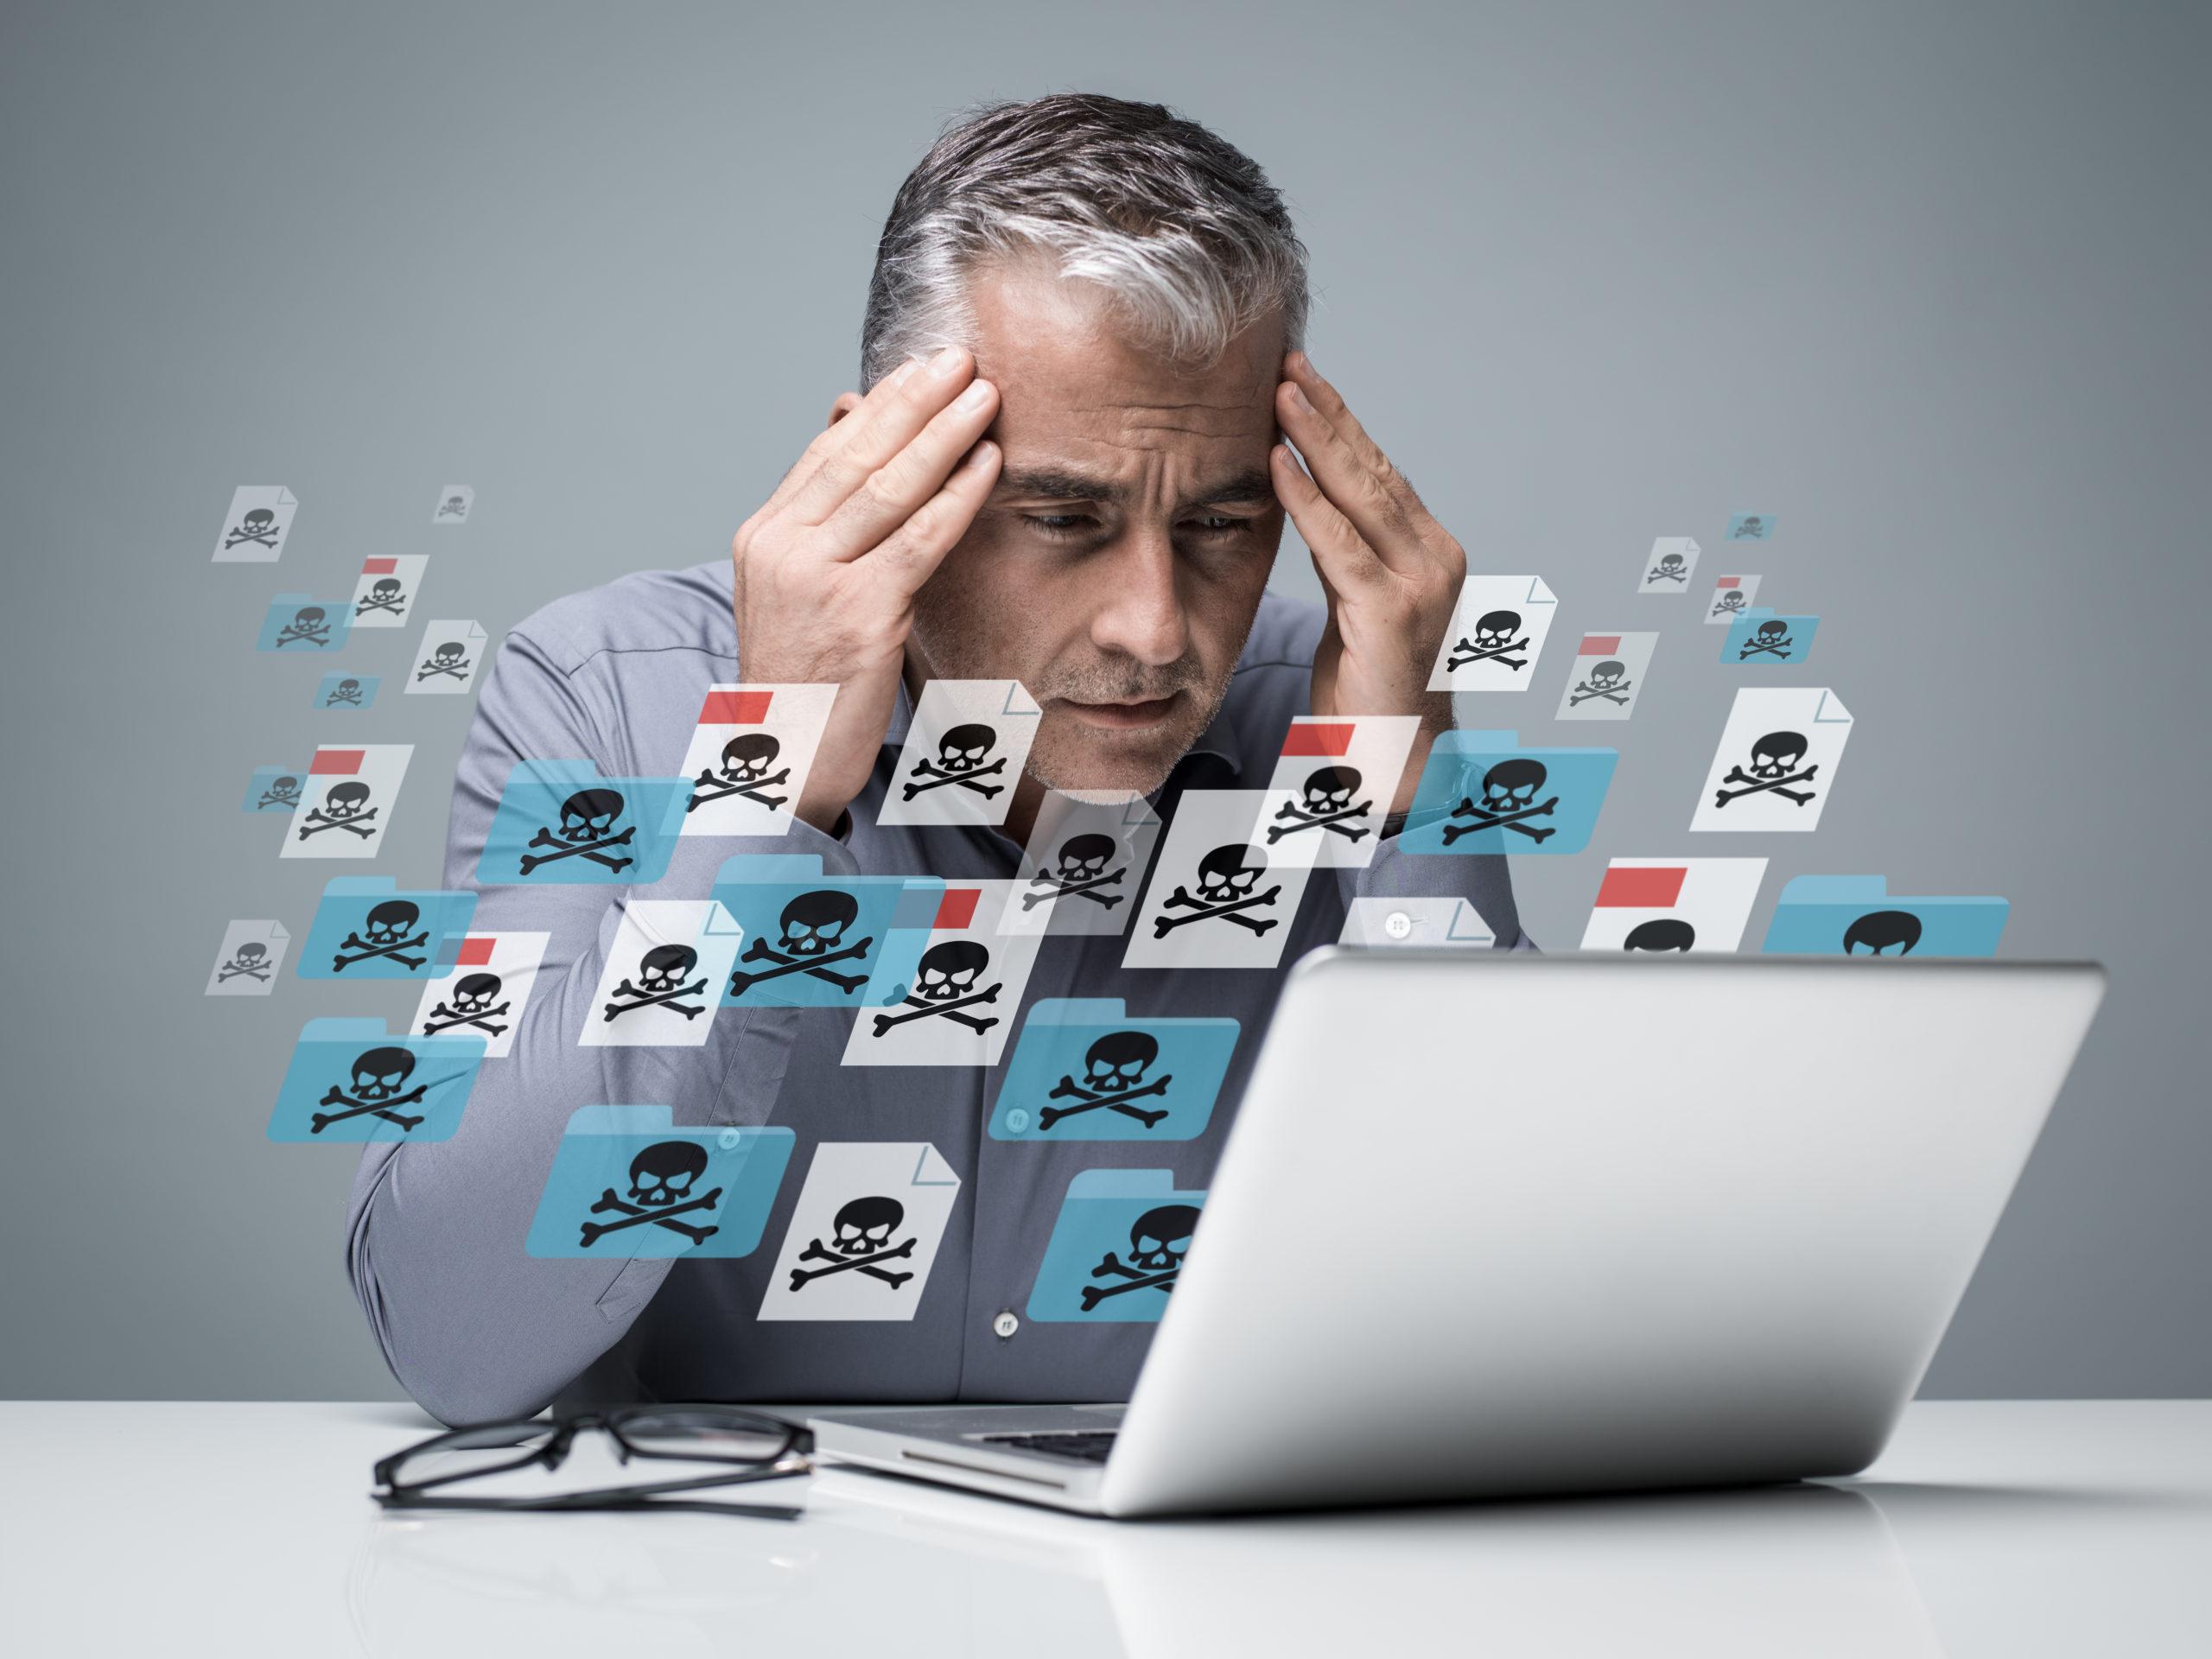 Menaces ordinateur